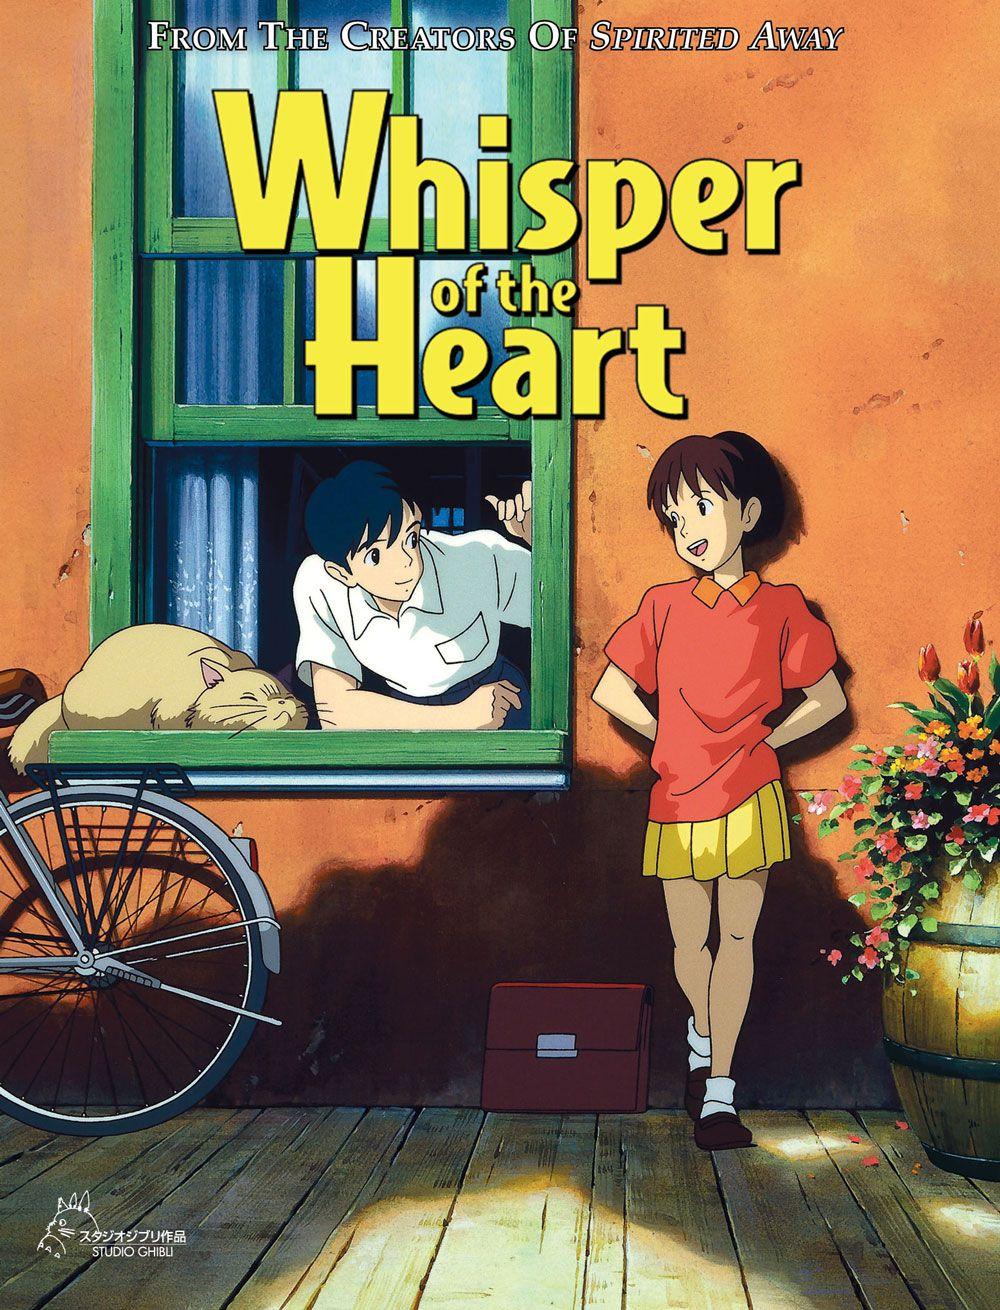 Whispers of the Heart Anime Movie Studio ghibli movies